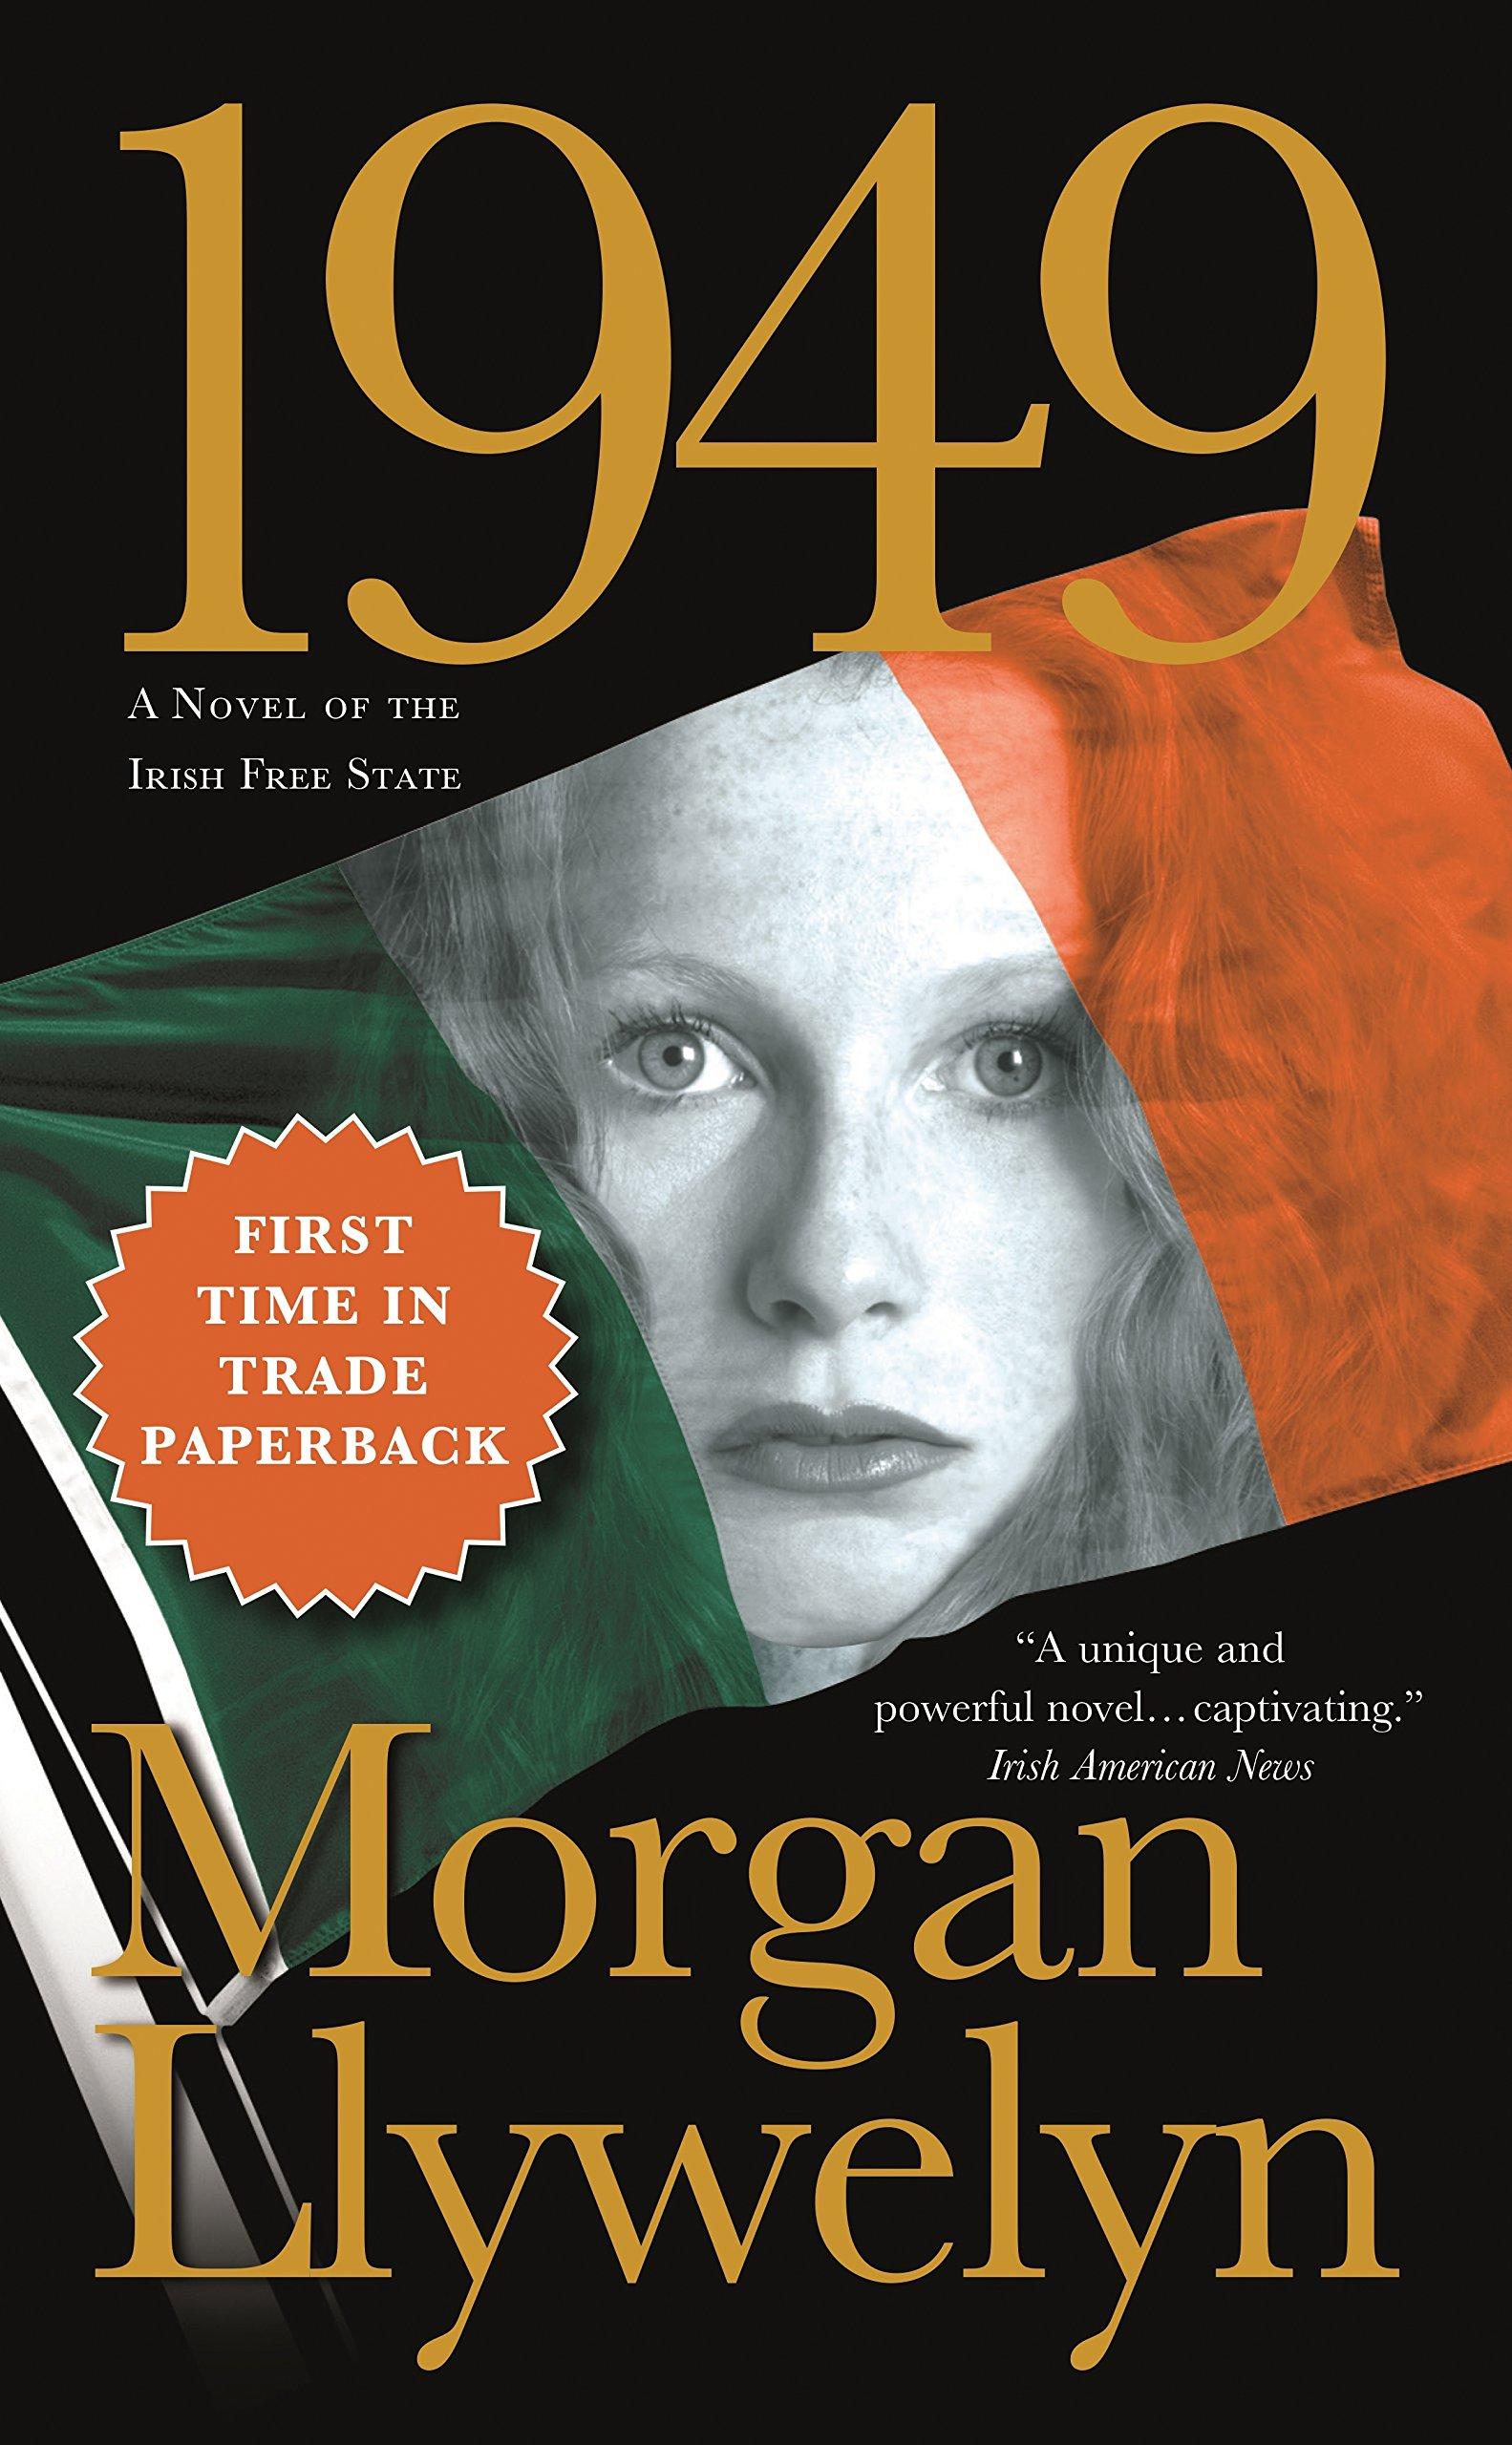 1949: A Novel of the Irish Free State (Irish Century): Morgan Llywelyn:  9780765381347: Amazon.com: Books